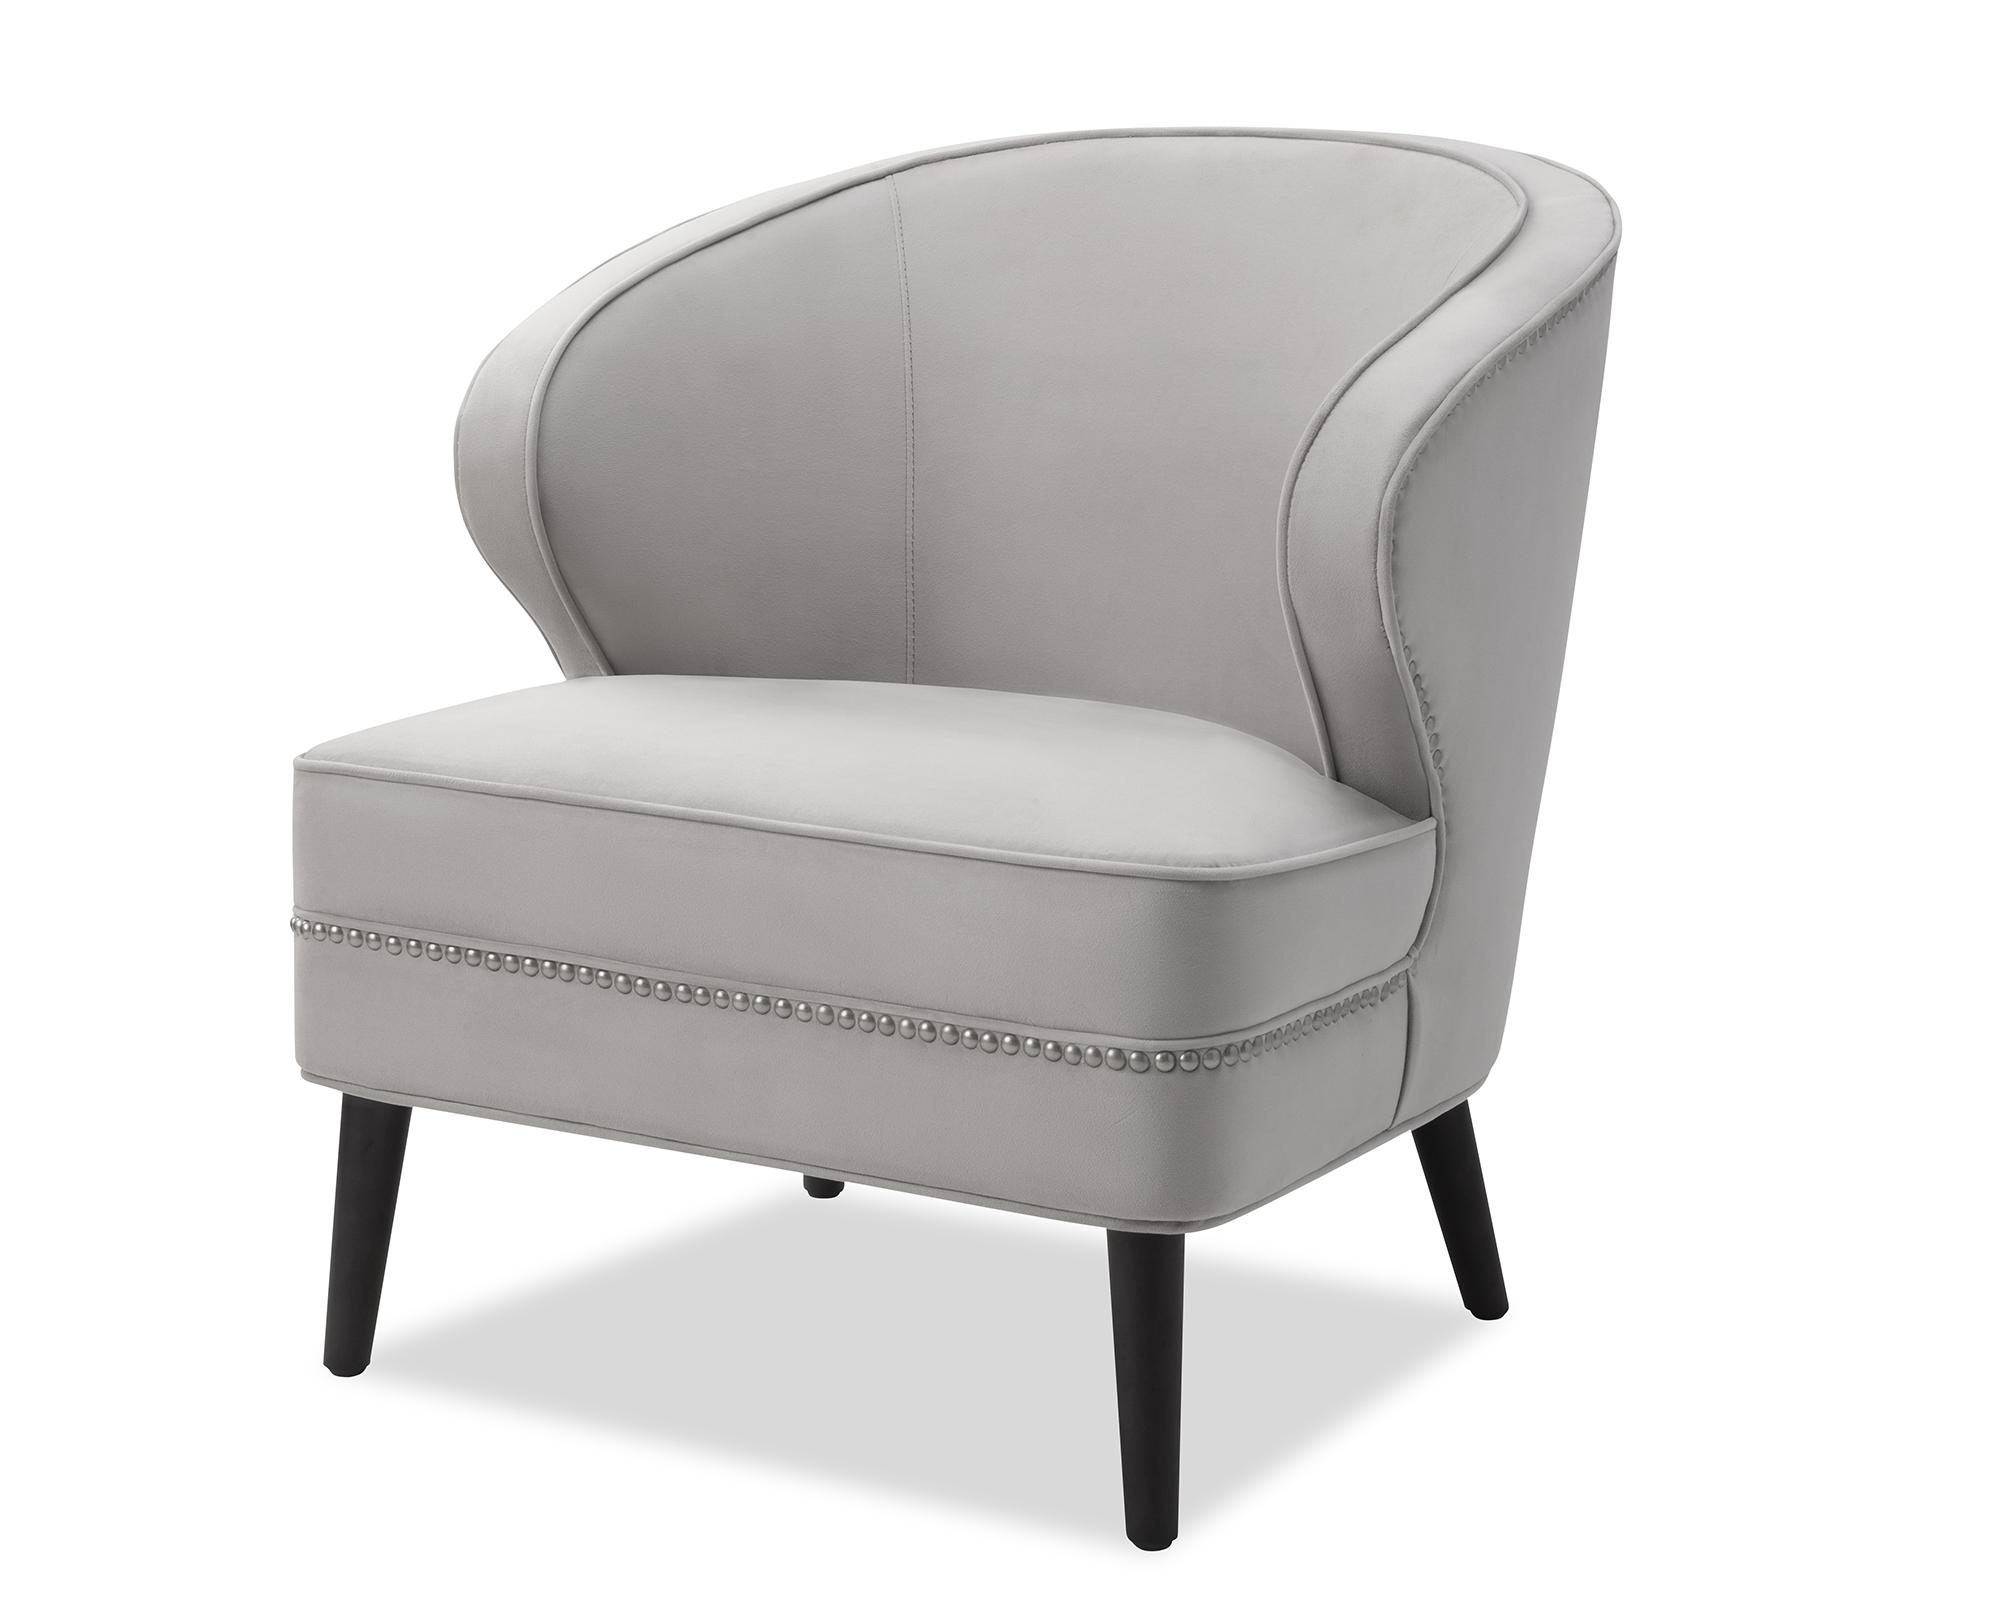 Liang & Eimil Lindsay Occasional Chair Fog Grey Velvet BH-OCH-137 (1)